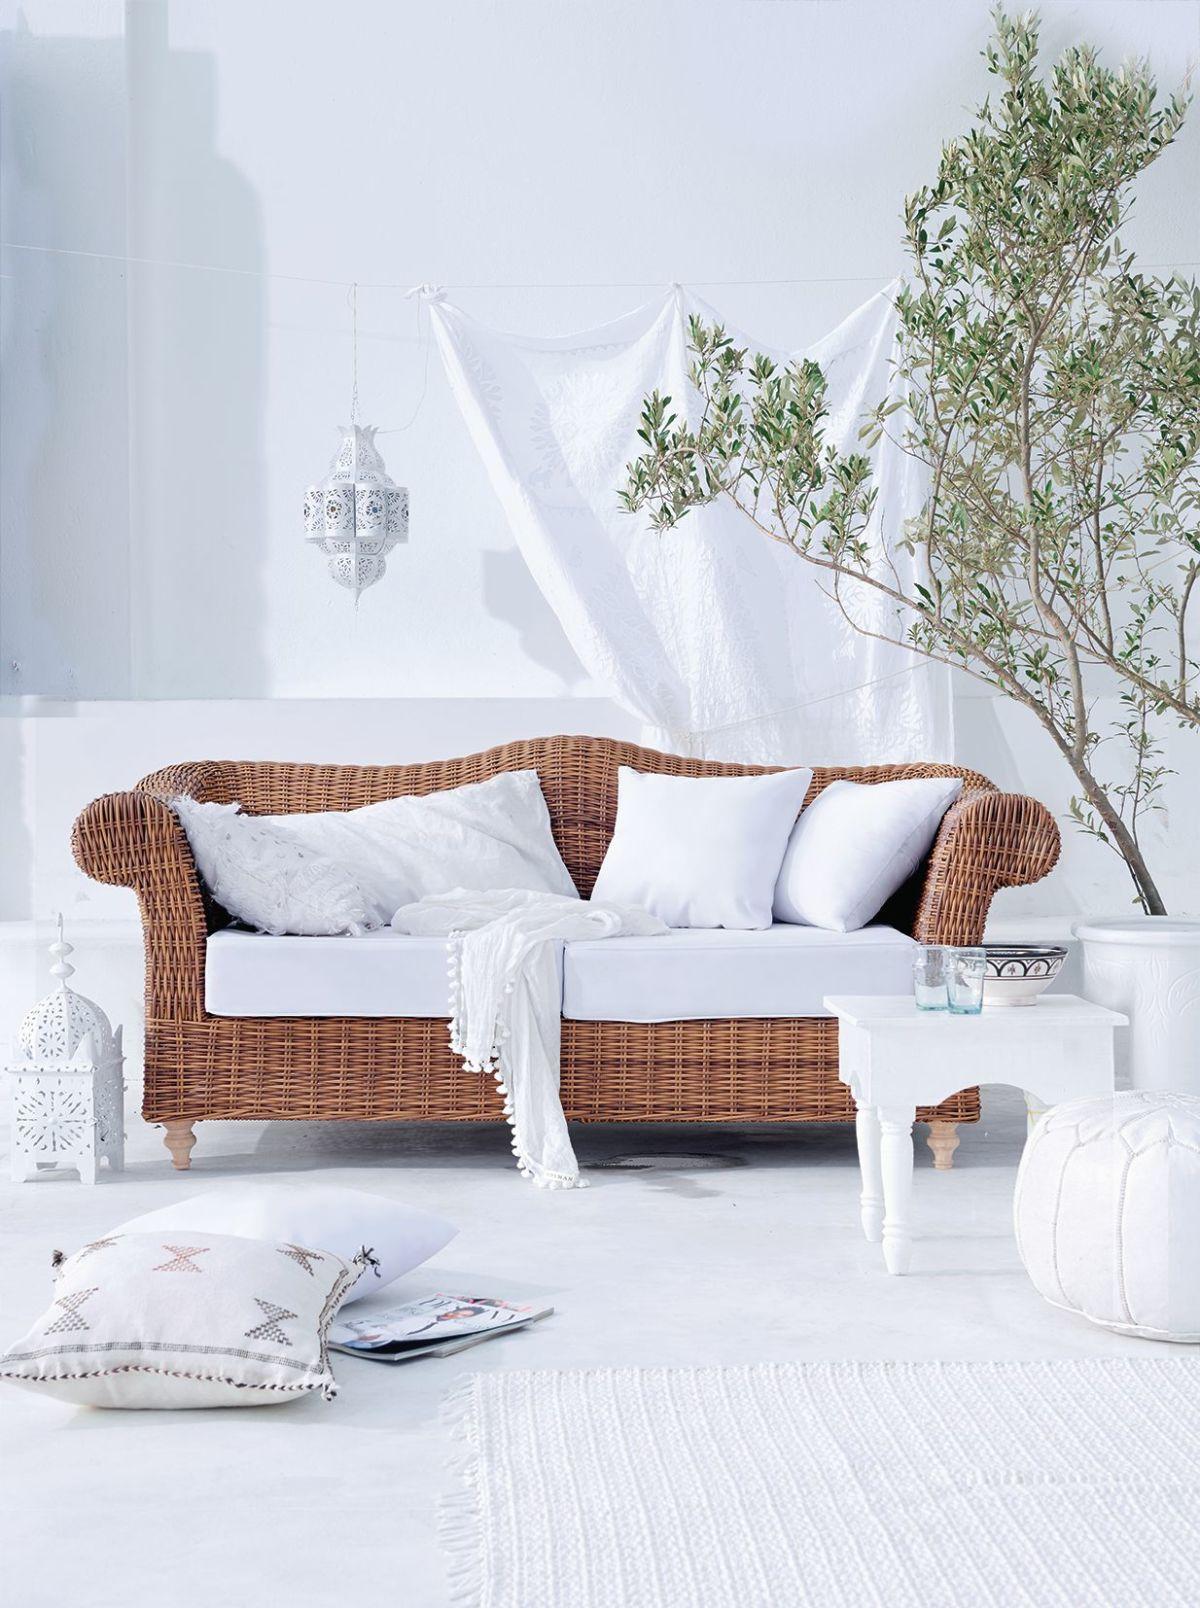 Outdoor-Sofa, Barock Look, Kunststoffrattan, Aluminium (Impressionen)